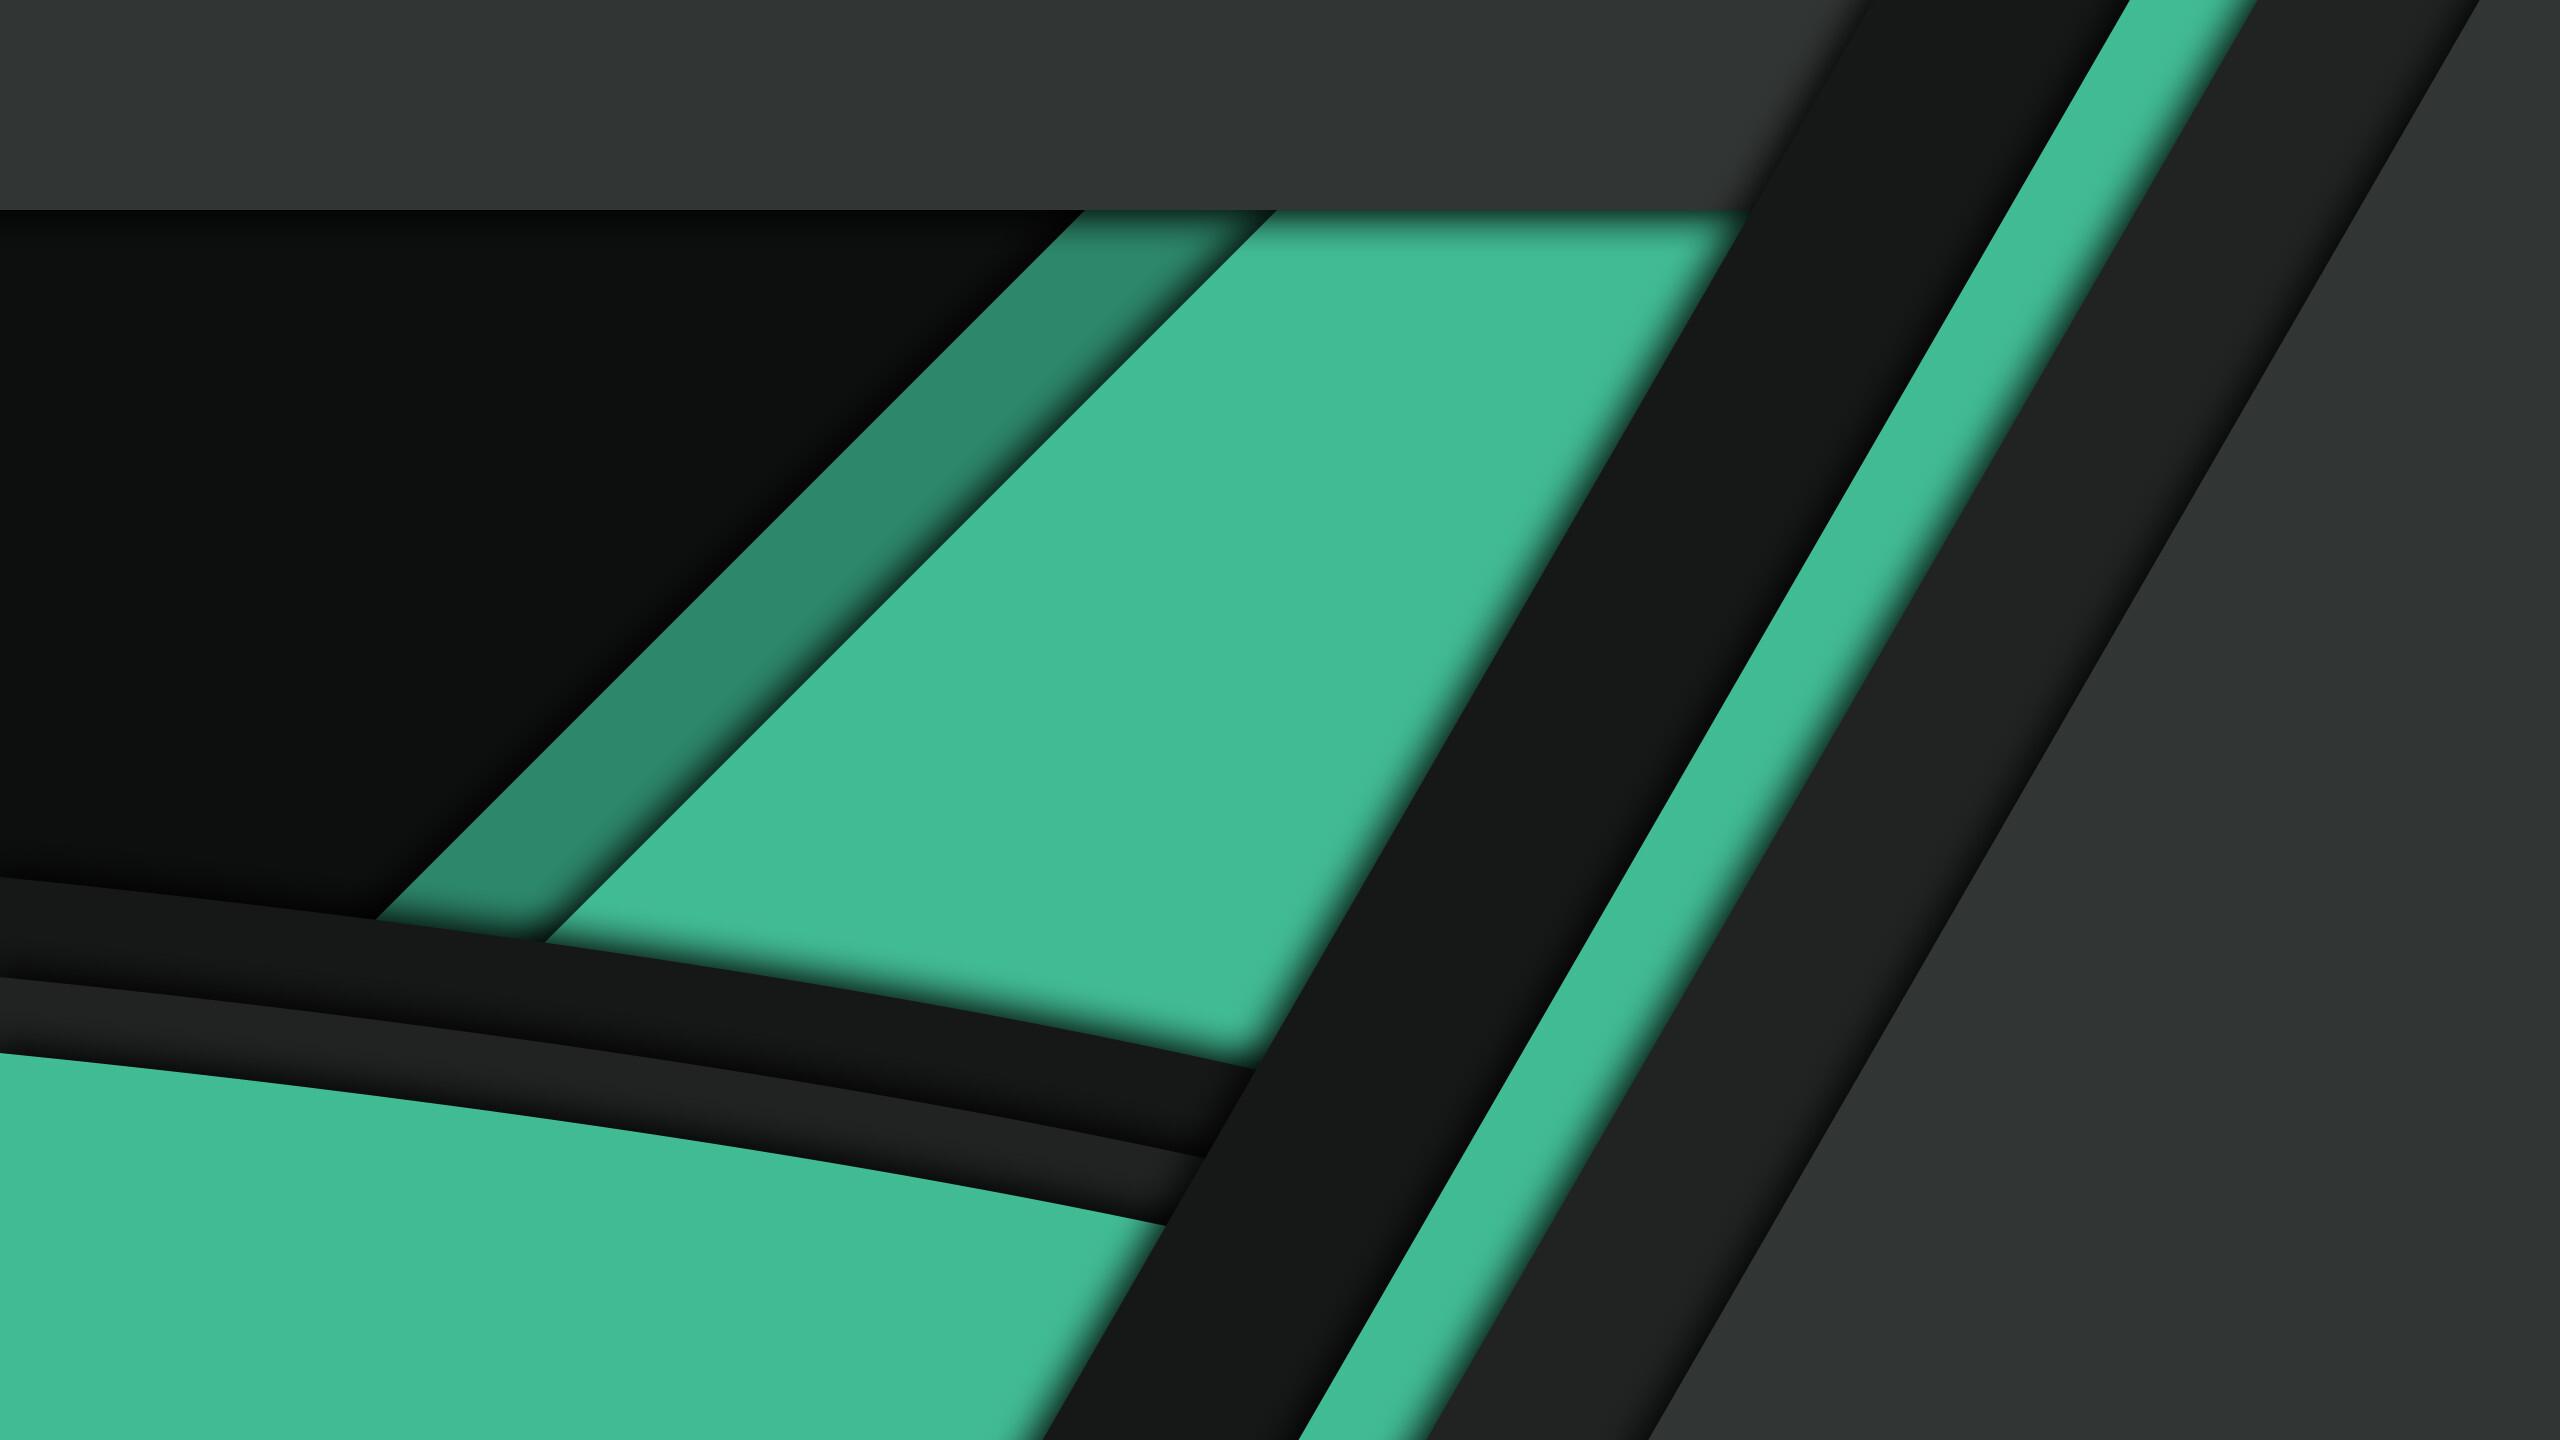 2560x1440 Black Green Material Design 1440P Resolution HD ...